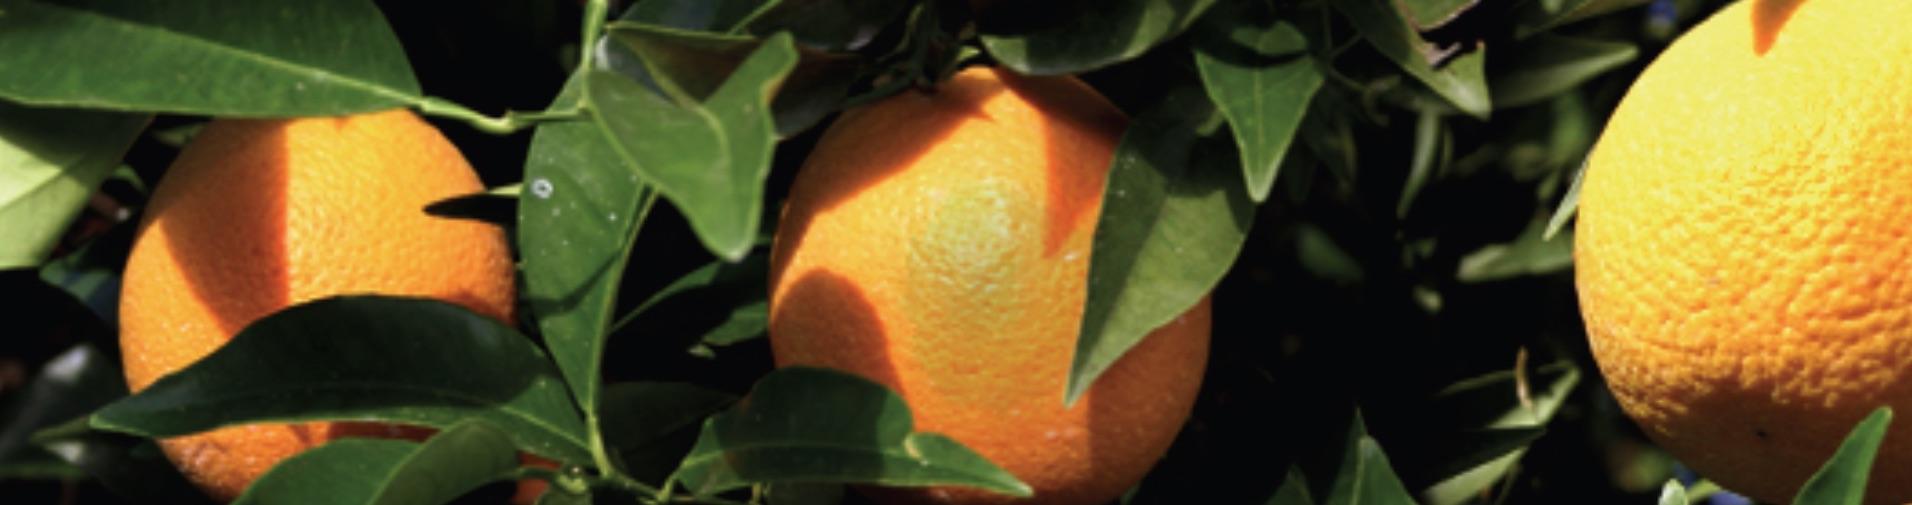 LA Declares Citrus Matters TODAY